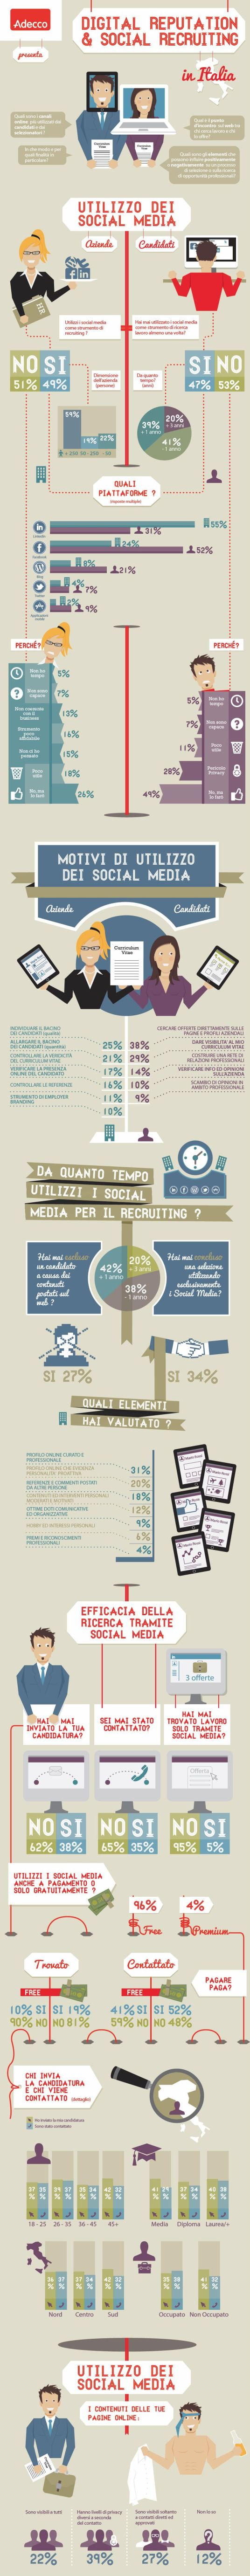 Digital Reputation e Social Recruiting in Italia #infographic #socialmedia #recruiting